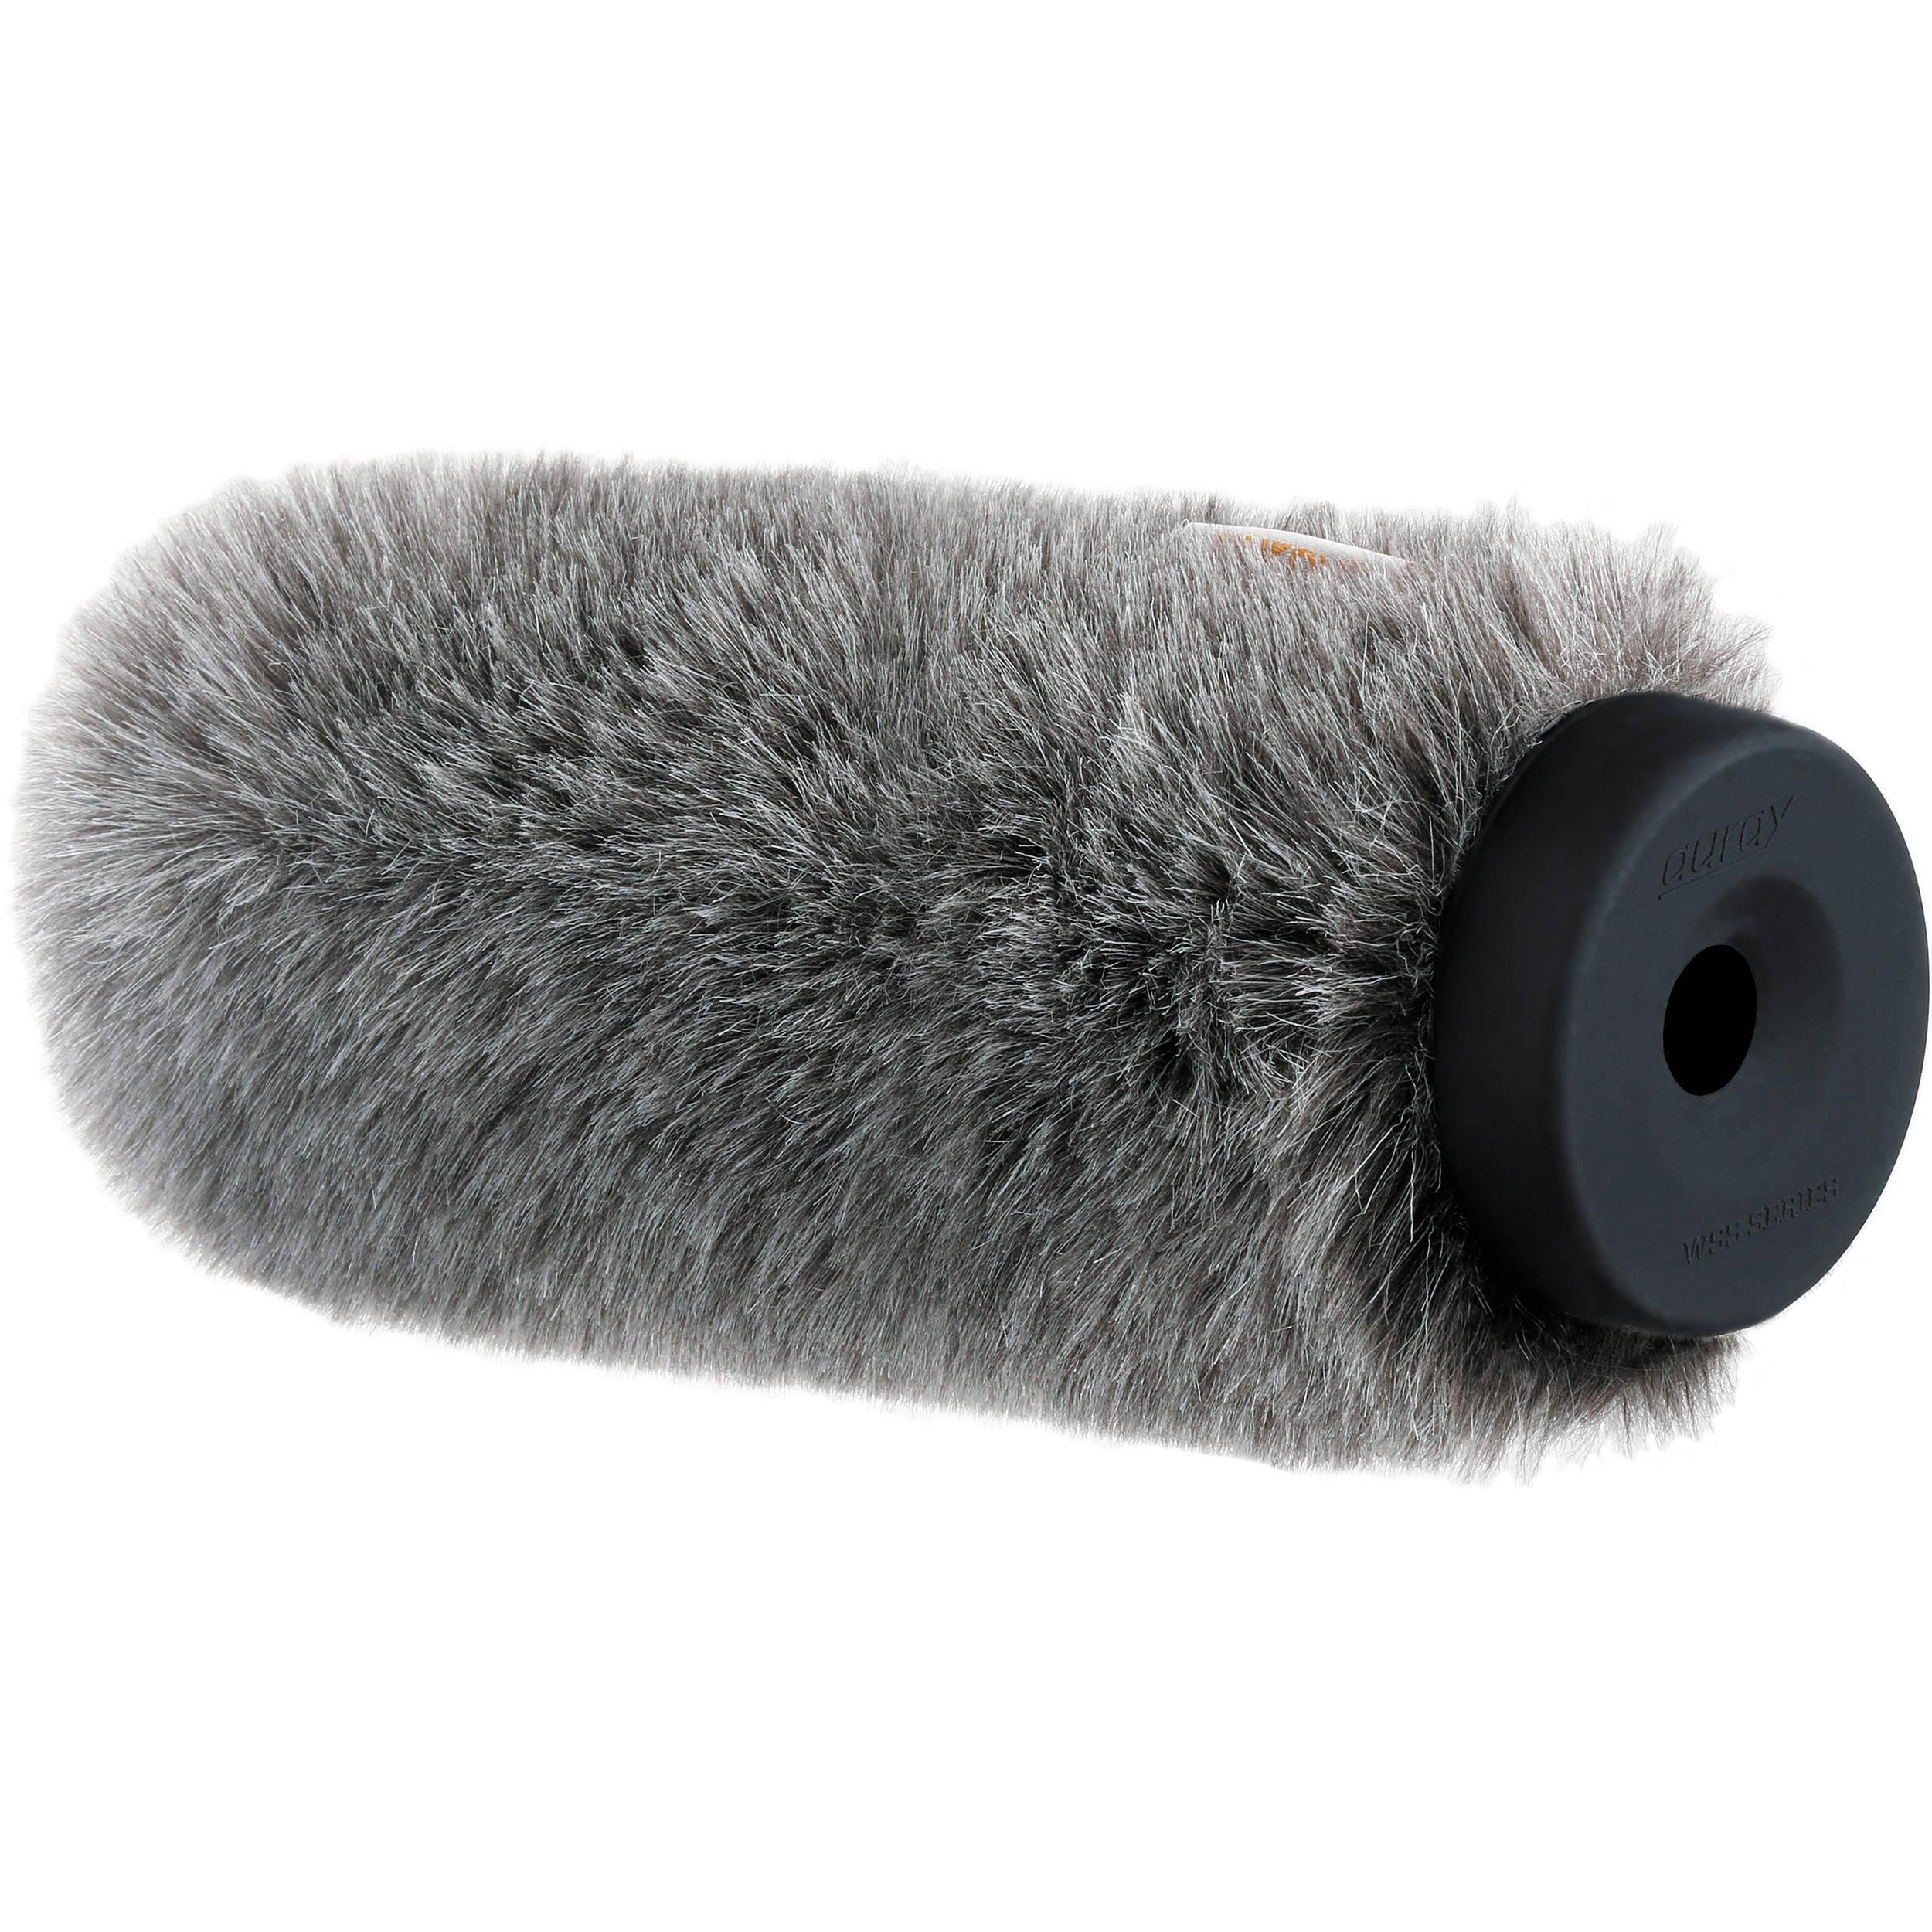 Gutmann Fur Microphone Windshield Windscreen for AKG Perception 220